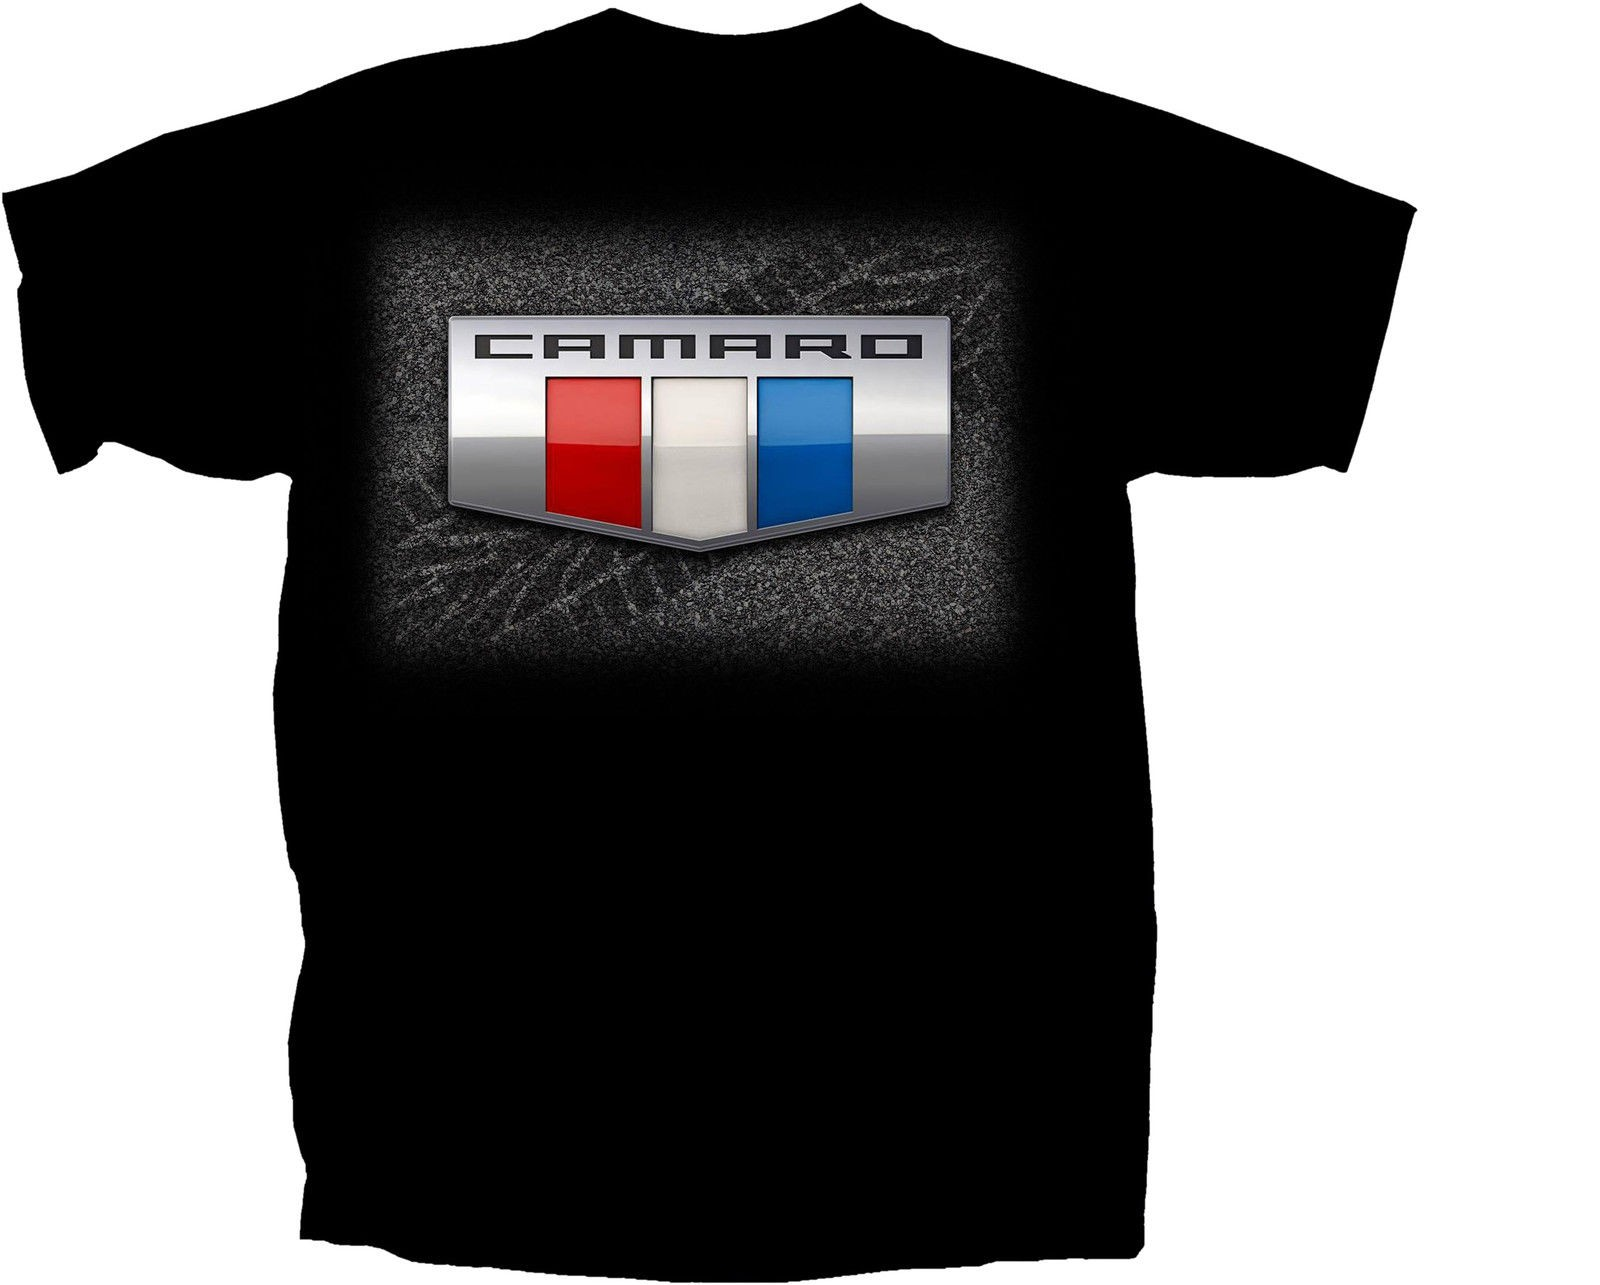 2016 Camaro Red White & Blue Badge Shield Crest Logo Black Tee Shirt